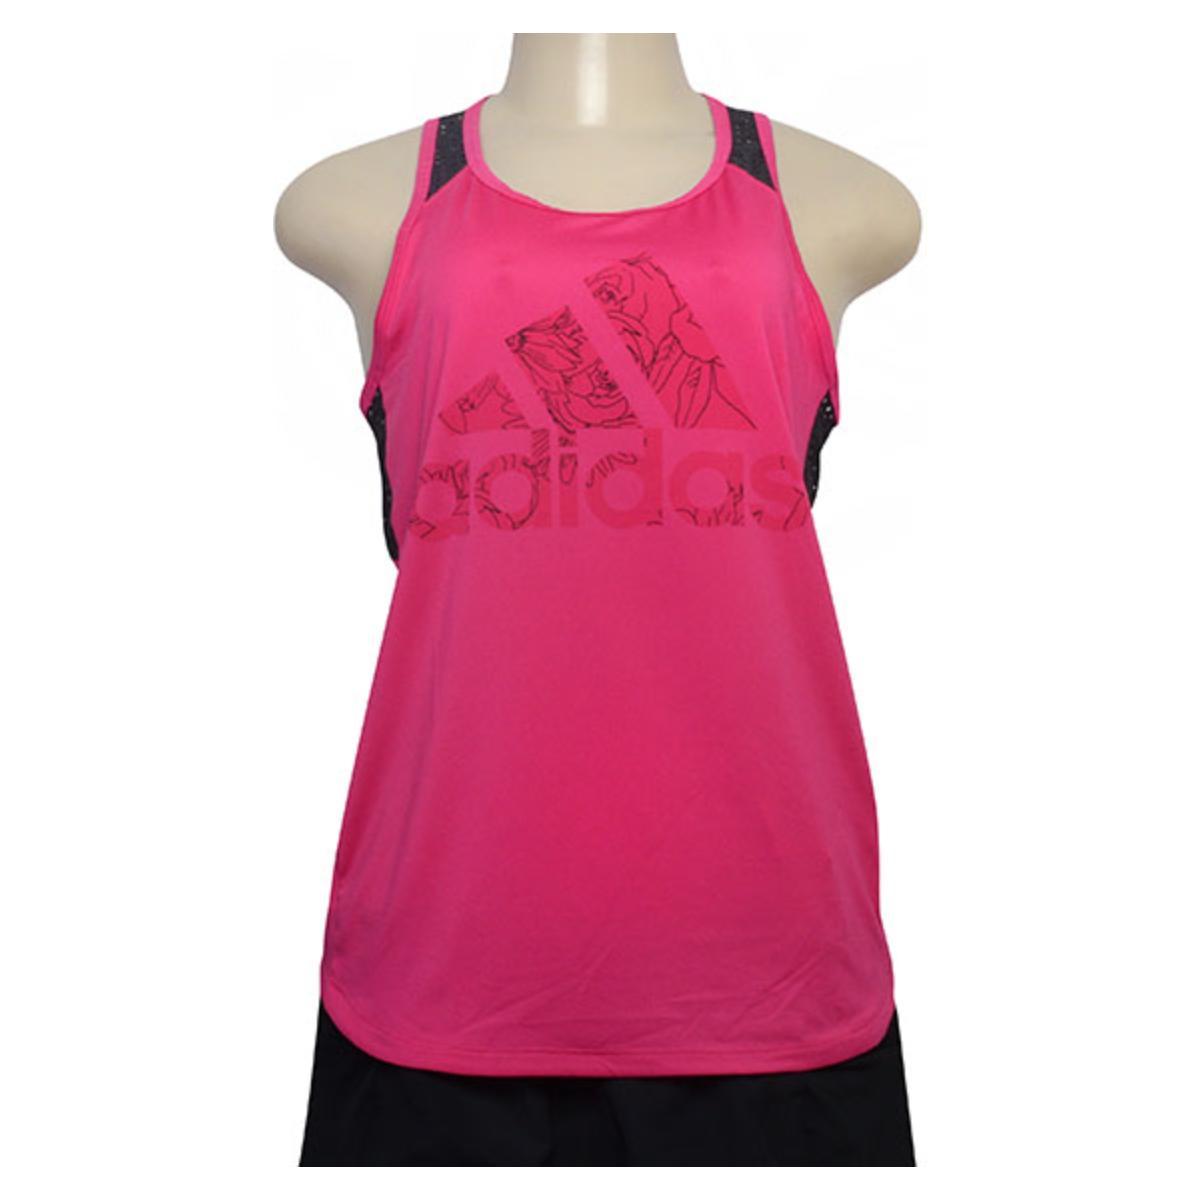 Regata Feminina Adidas Dn4143 bb Mesh Pink